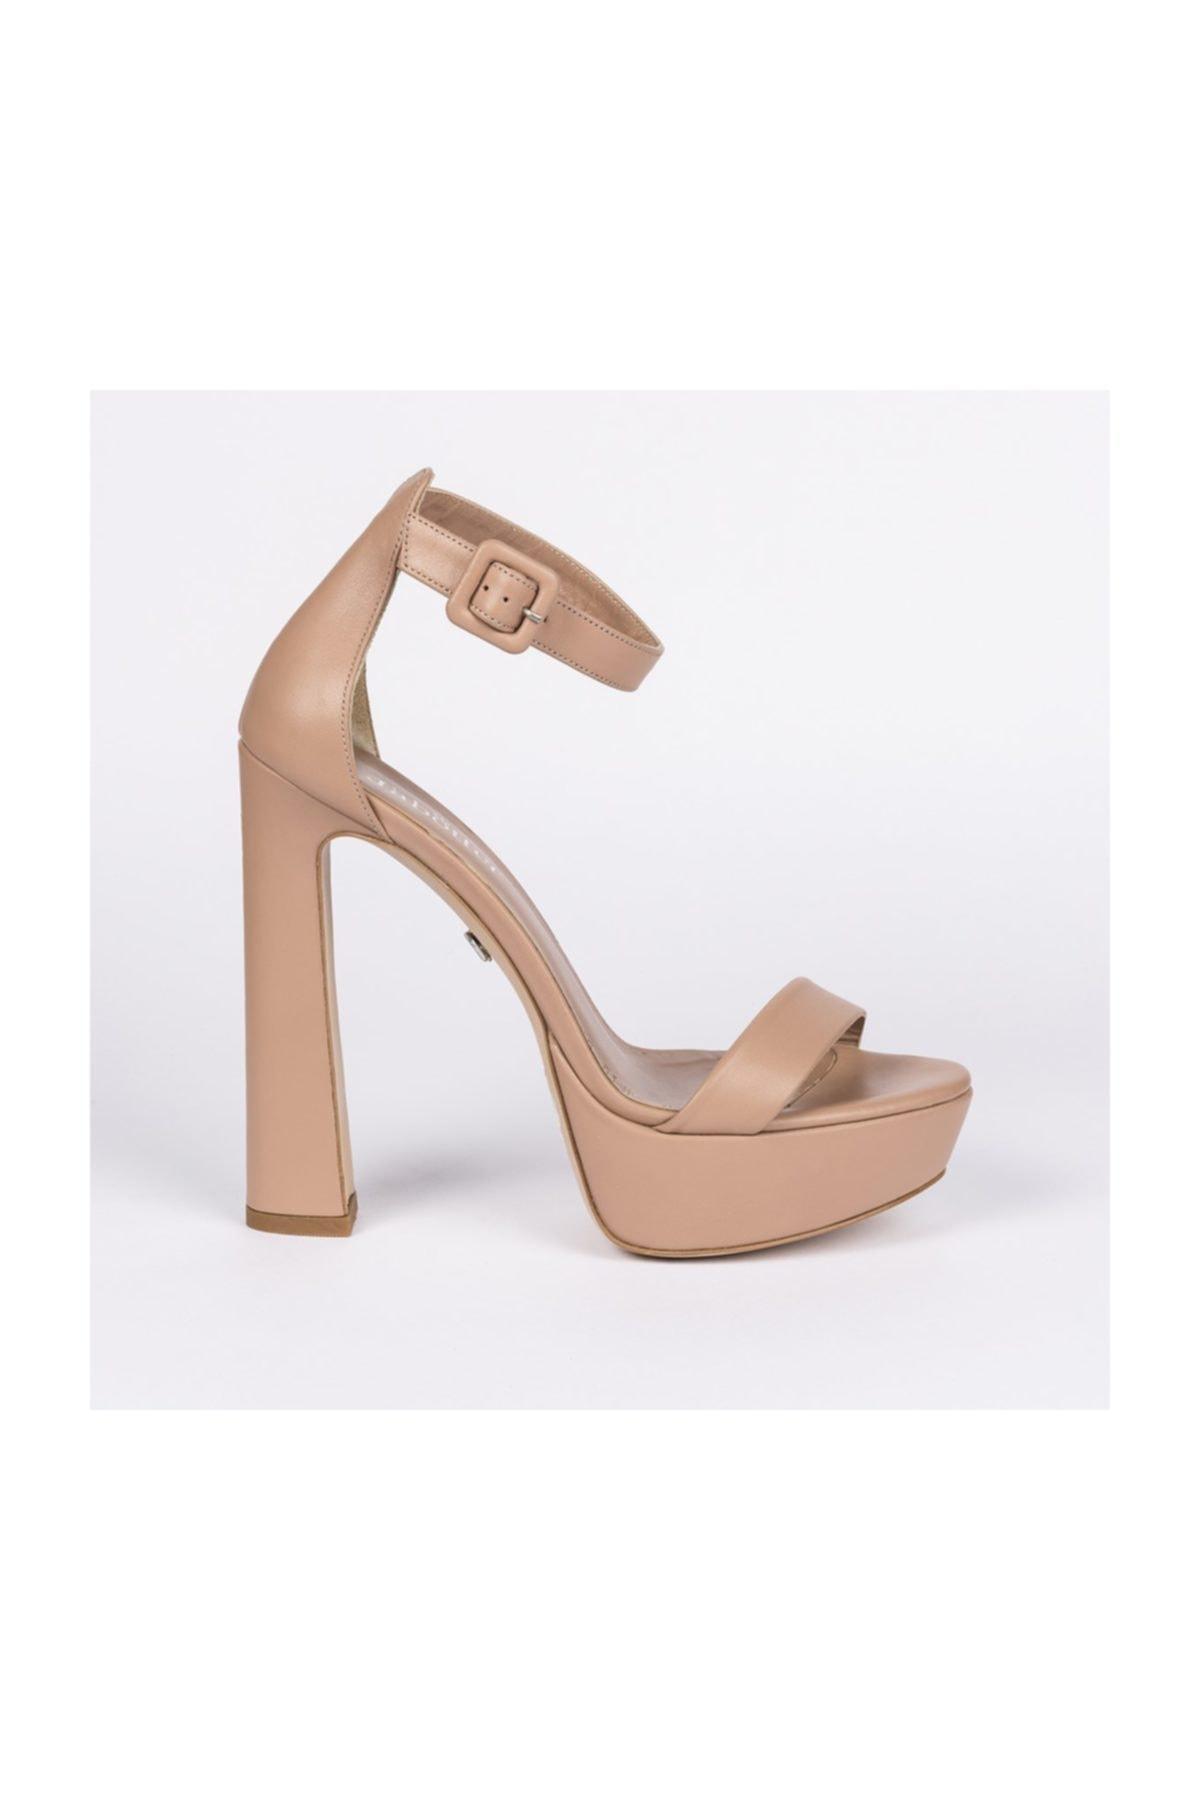 Jabotter Desire Karamel Deri Platform Topuklu Ayakkabı 1